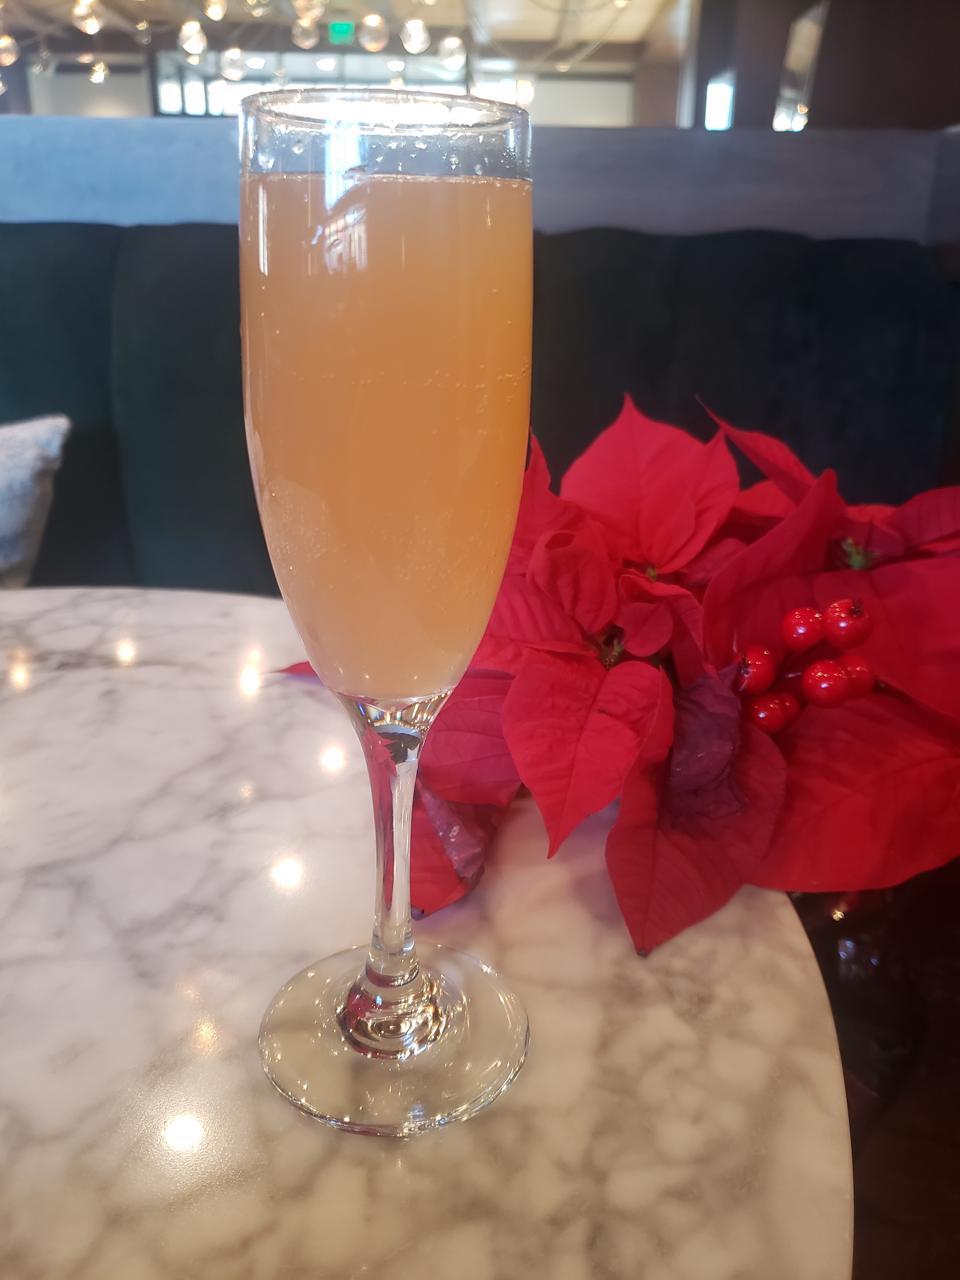 Festive champagne cocktail.